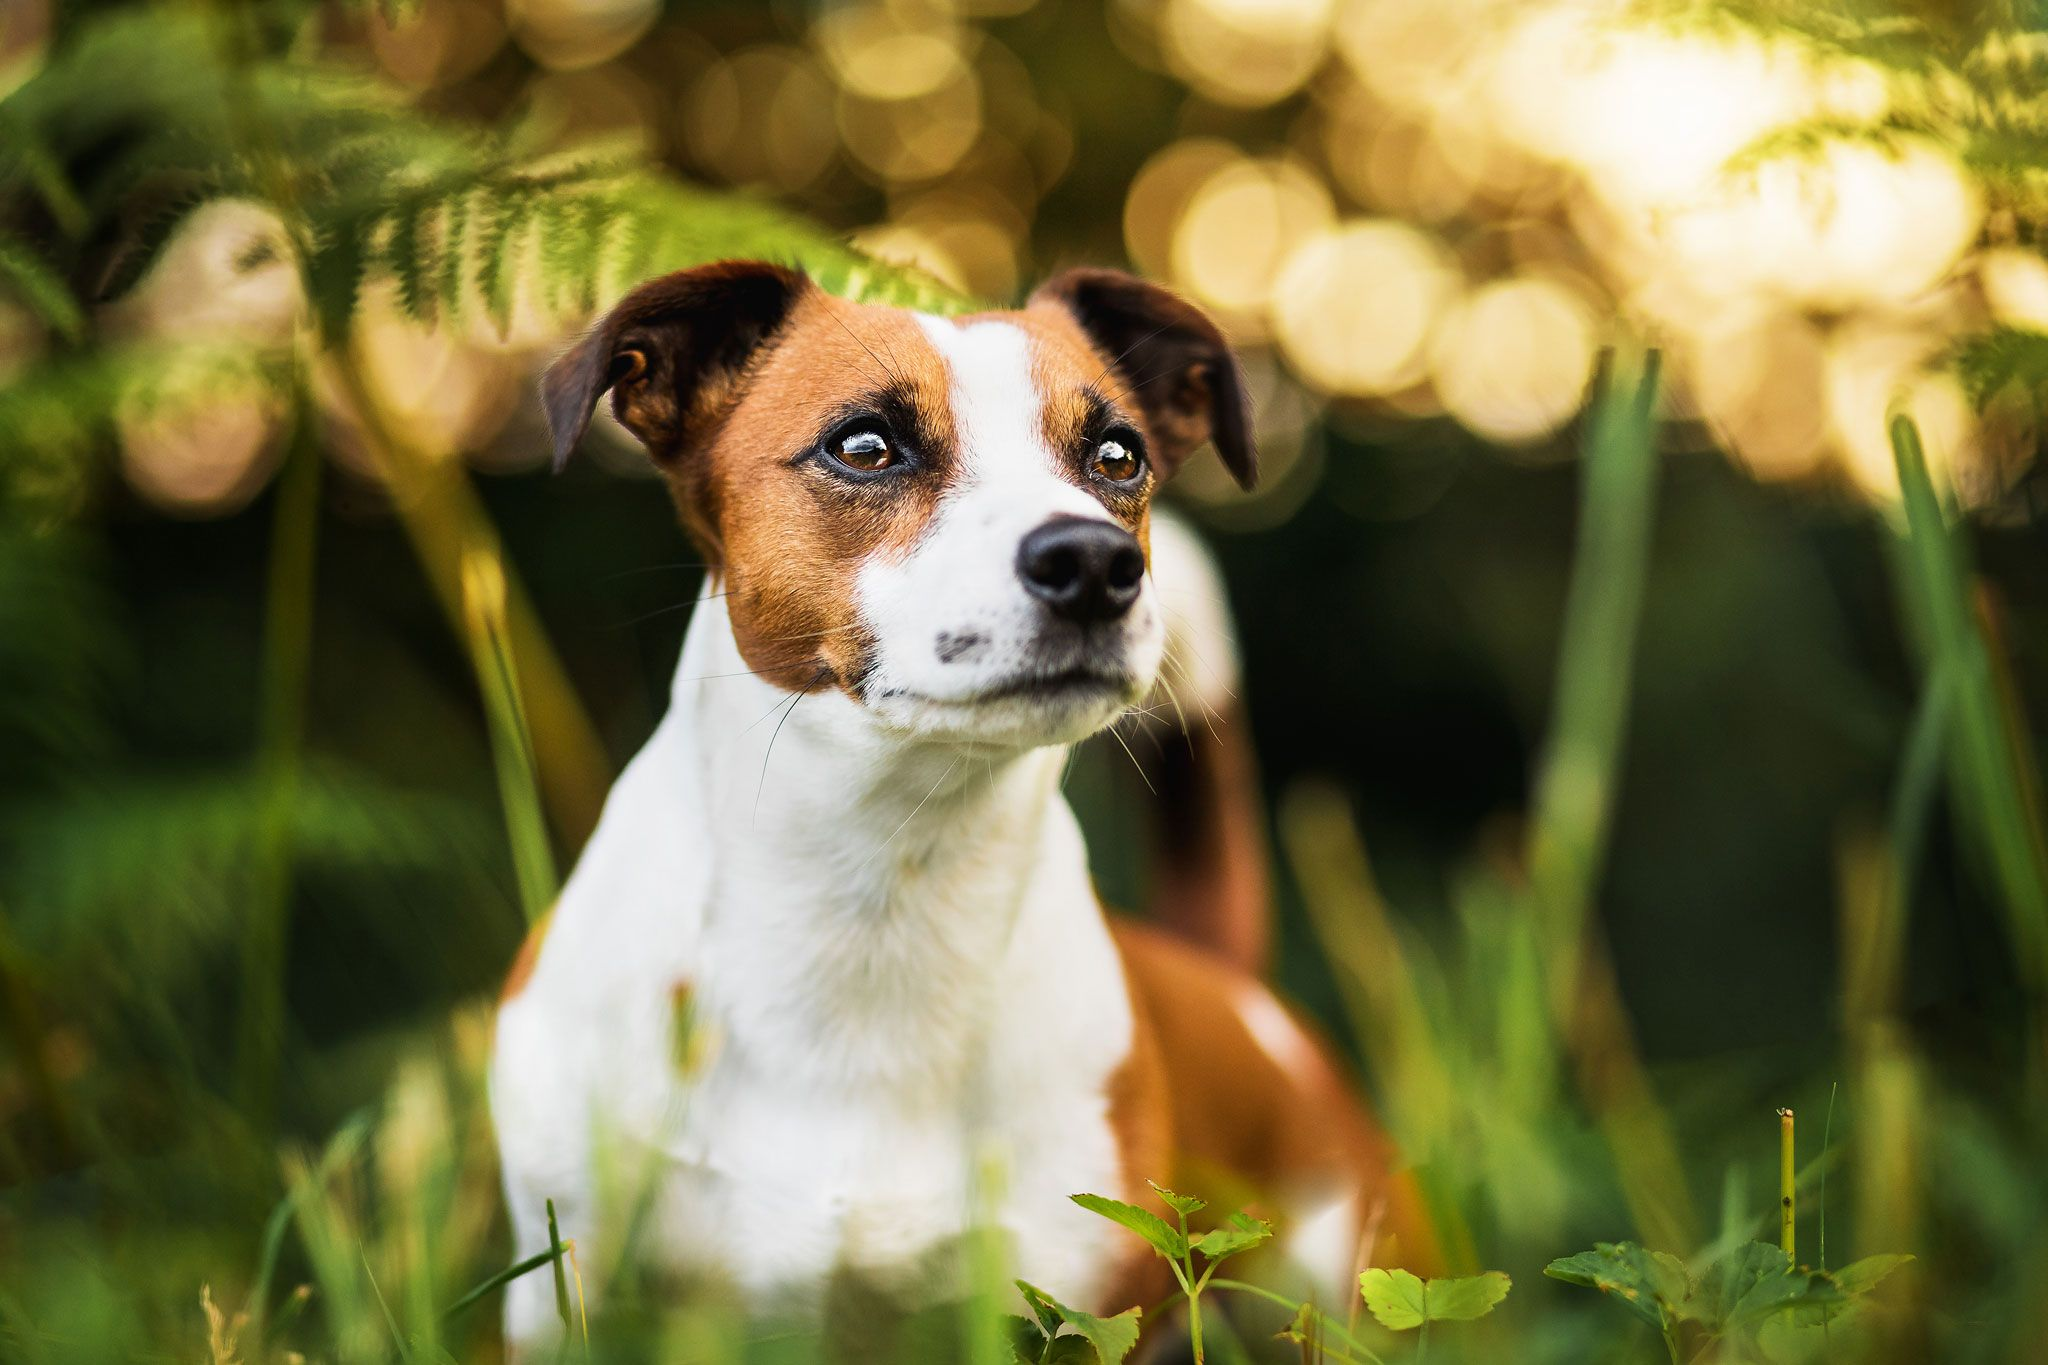 Golden Days Hundefotografin Anna Panke Hundefotografie Tierfotograf Fotografie